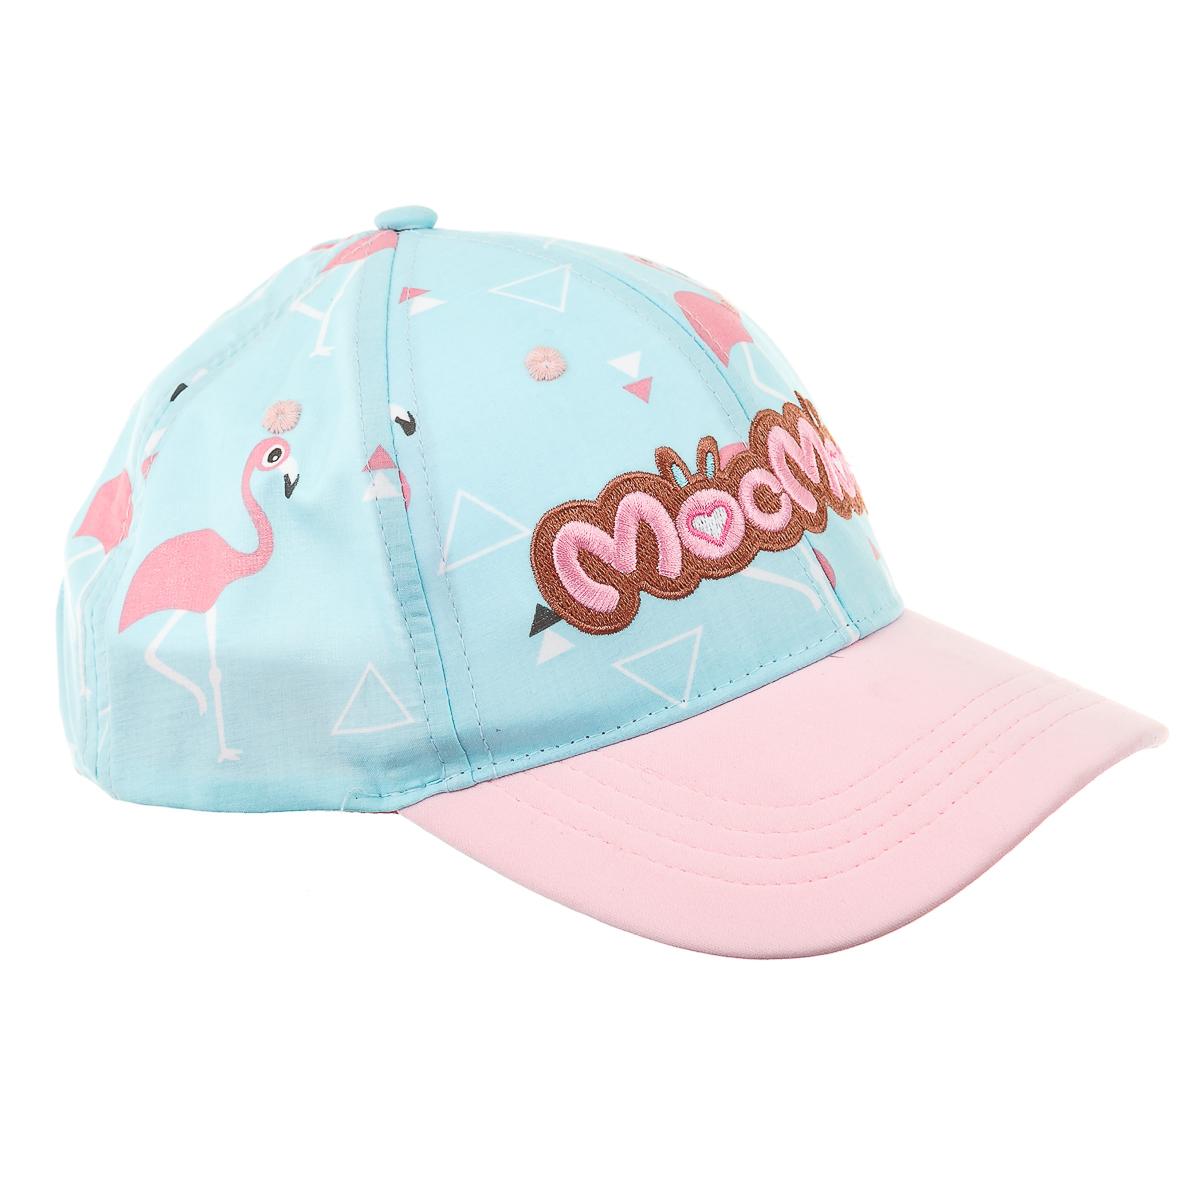 Кепка голубо-розовая с фламинго